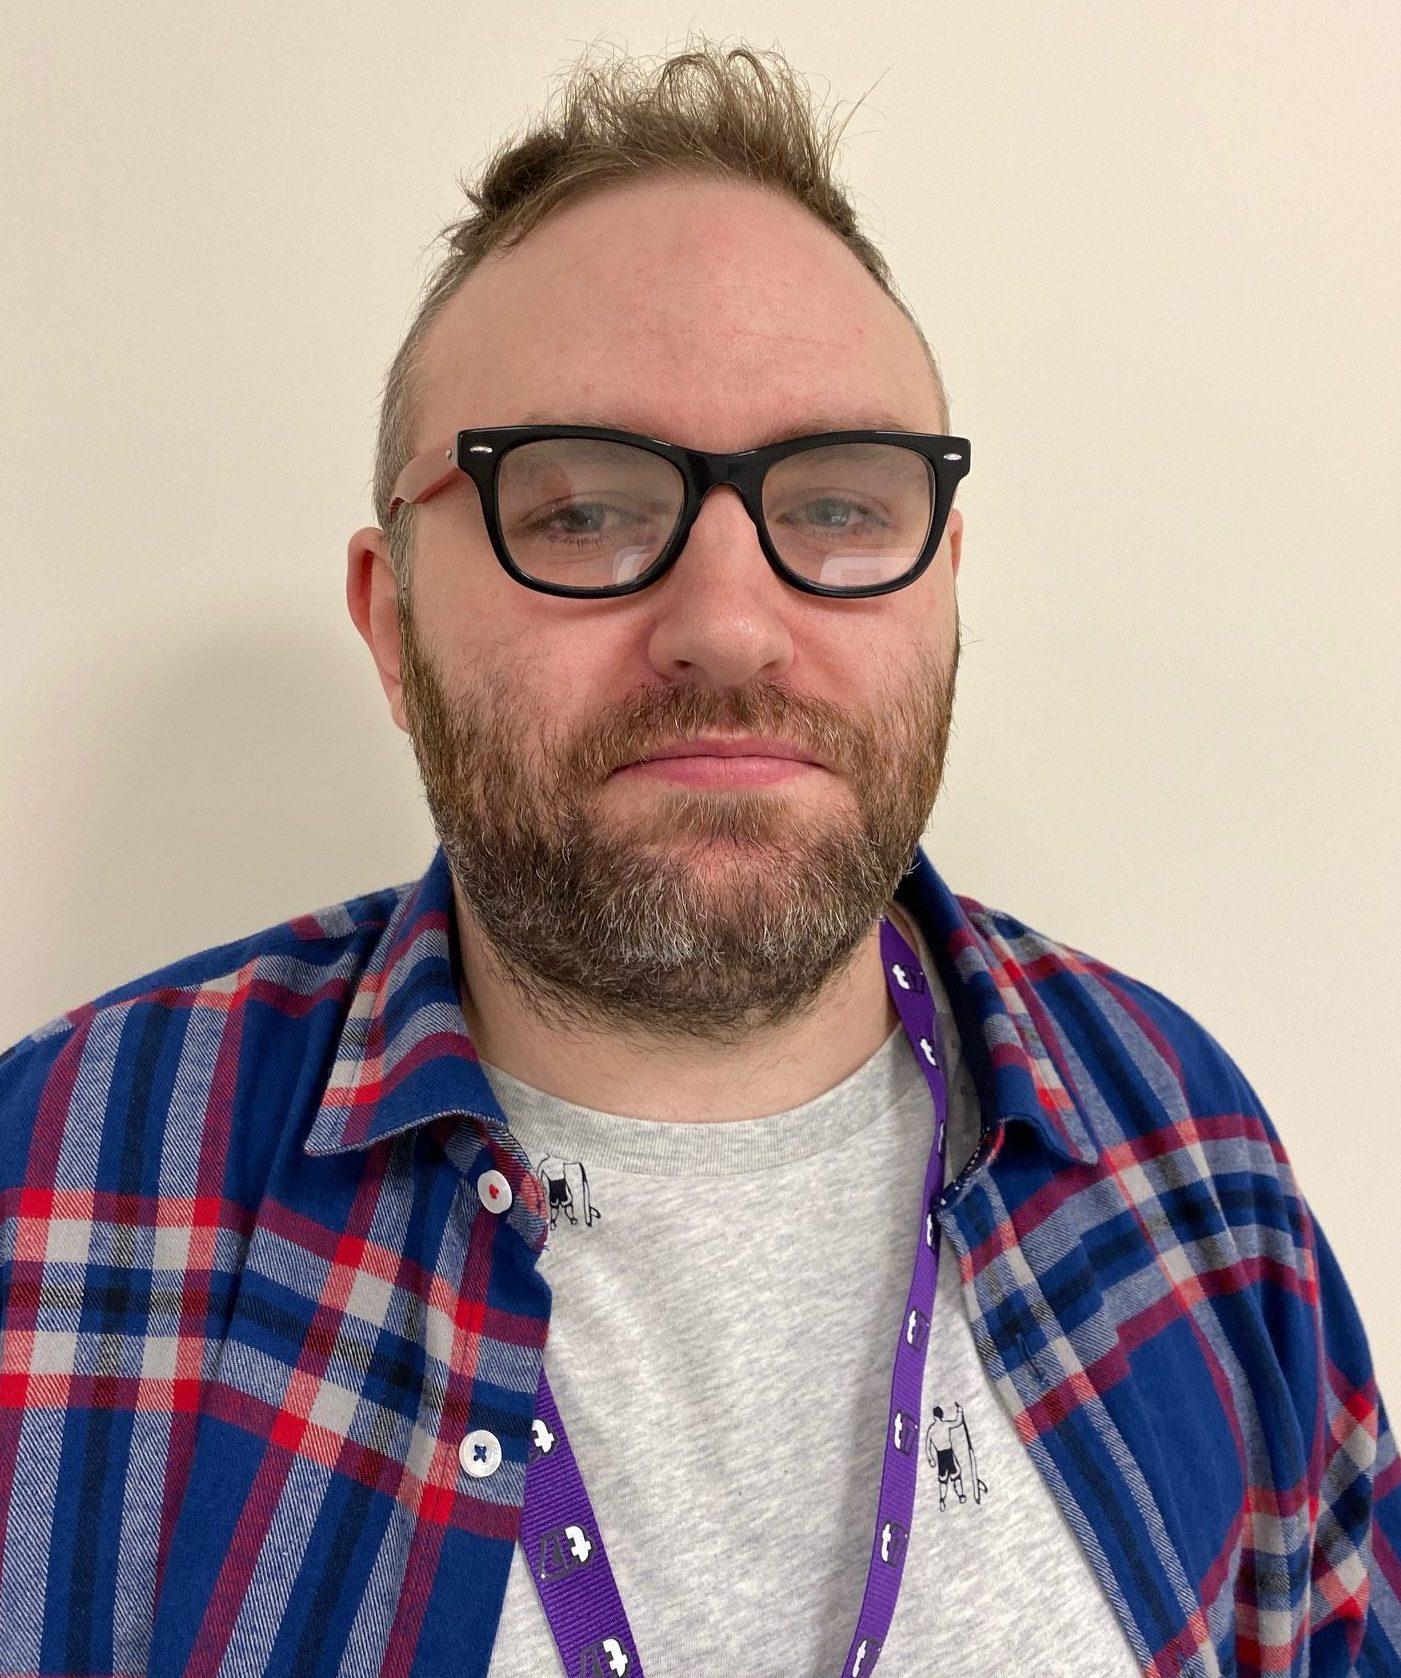 A photo of the presenter Ross Fairhurst